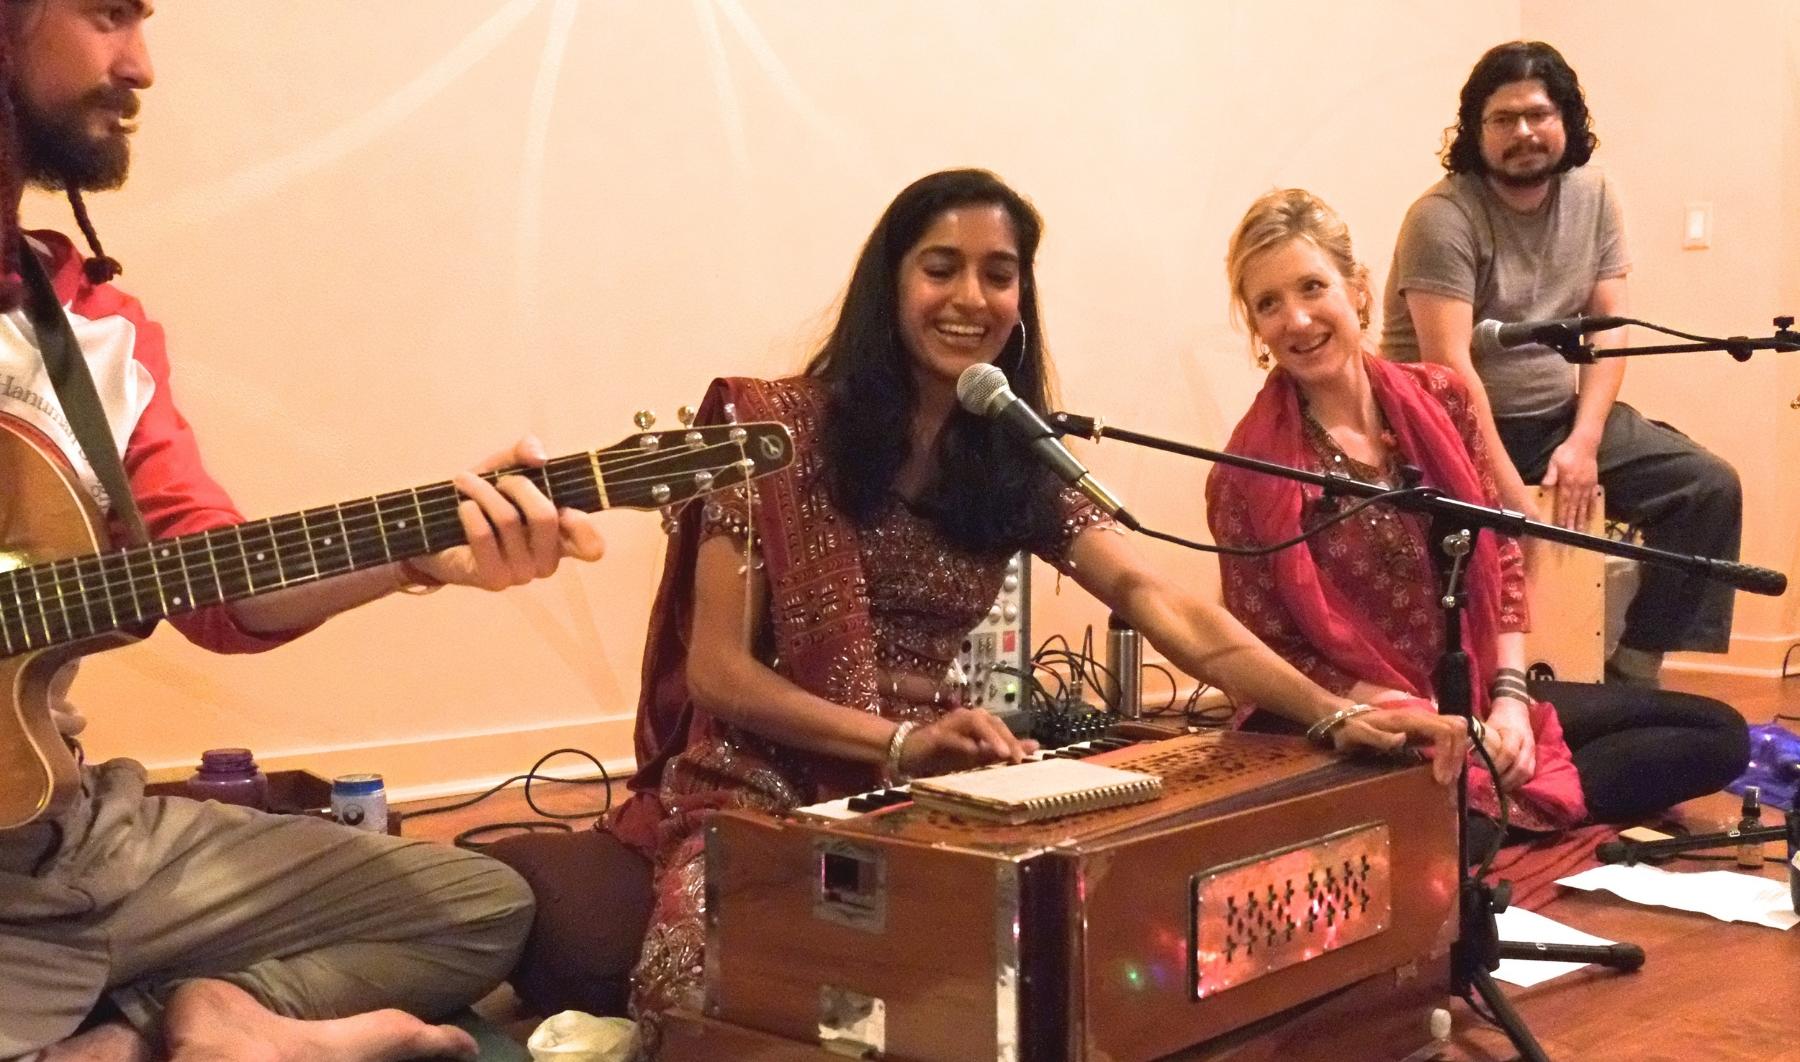 """We sing to the Deity to awaken the Deity within."" - Upanisads"